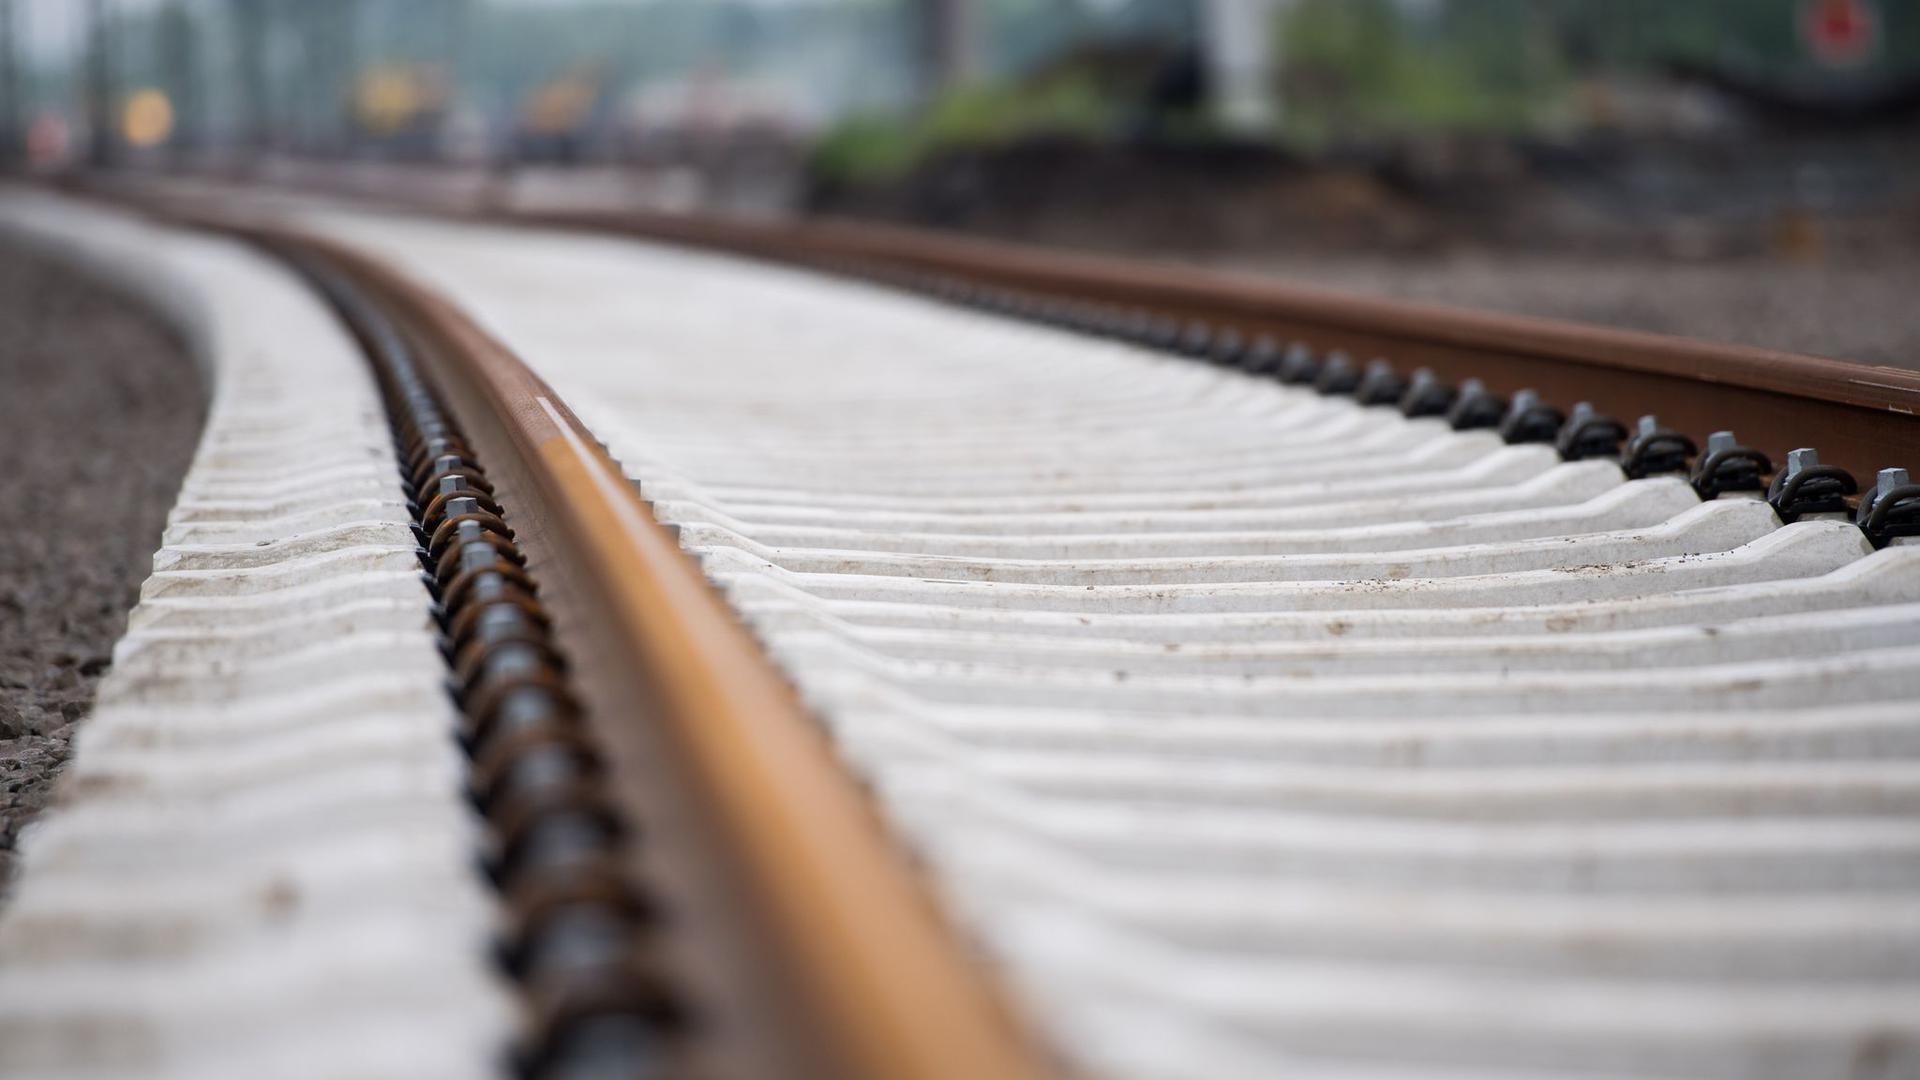 Der Bundesrechnungshof kritisiert den Kurs der Bundesregierung in der Bahnpolitik massiv.